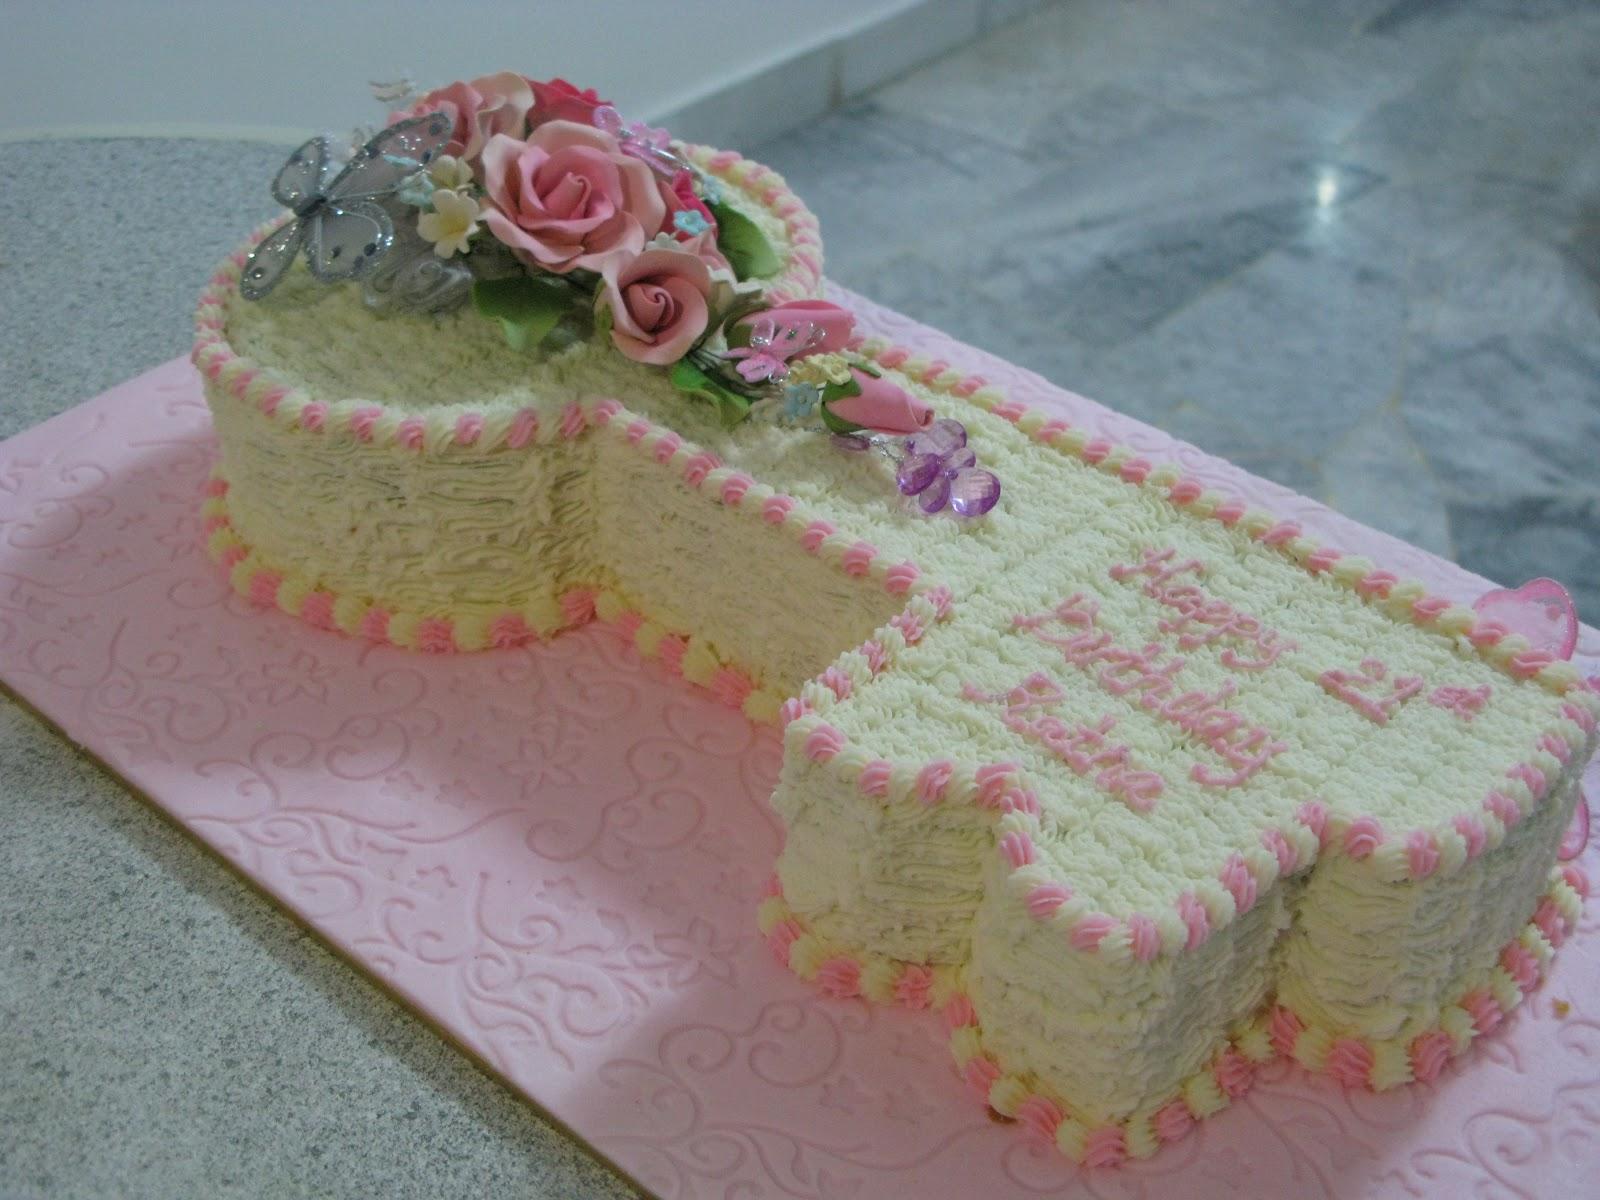 Key Cake Designs For 21st Birthday : Our Sugar Shack: Key shaped cake